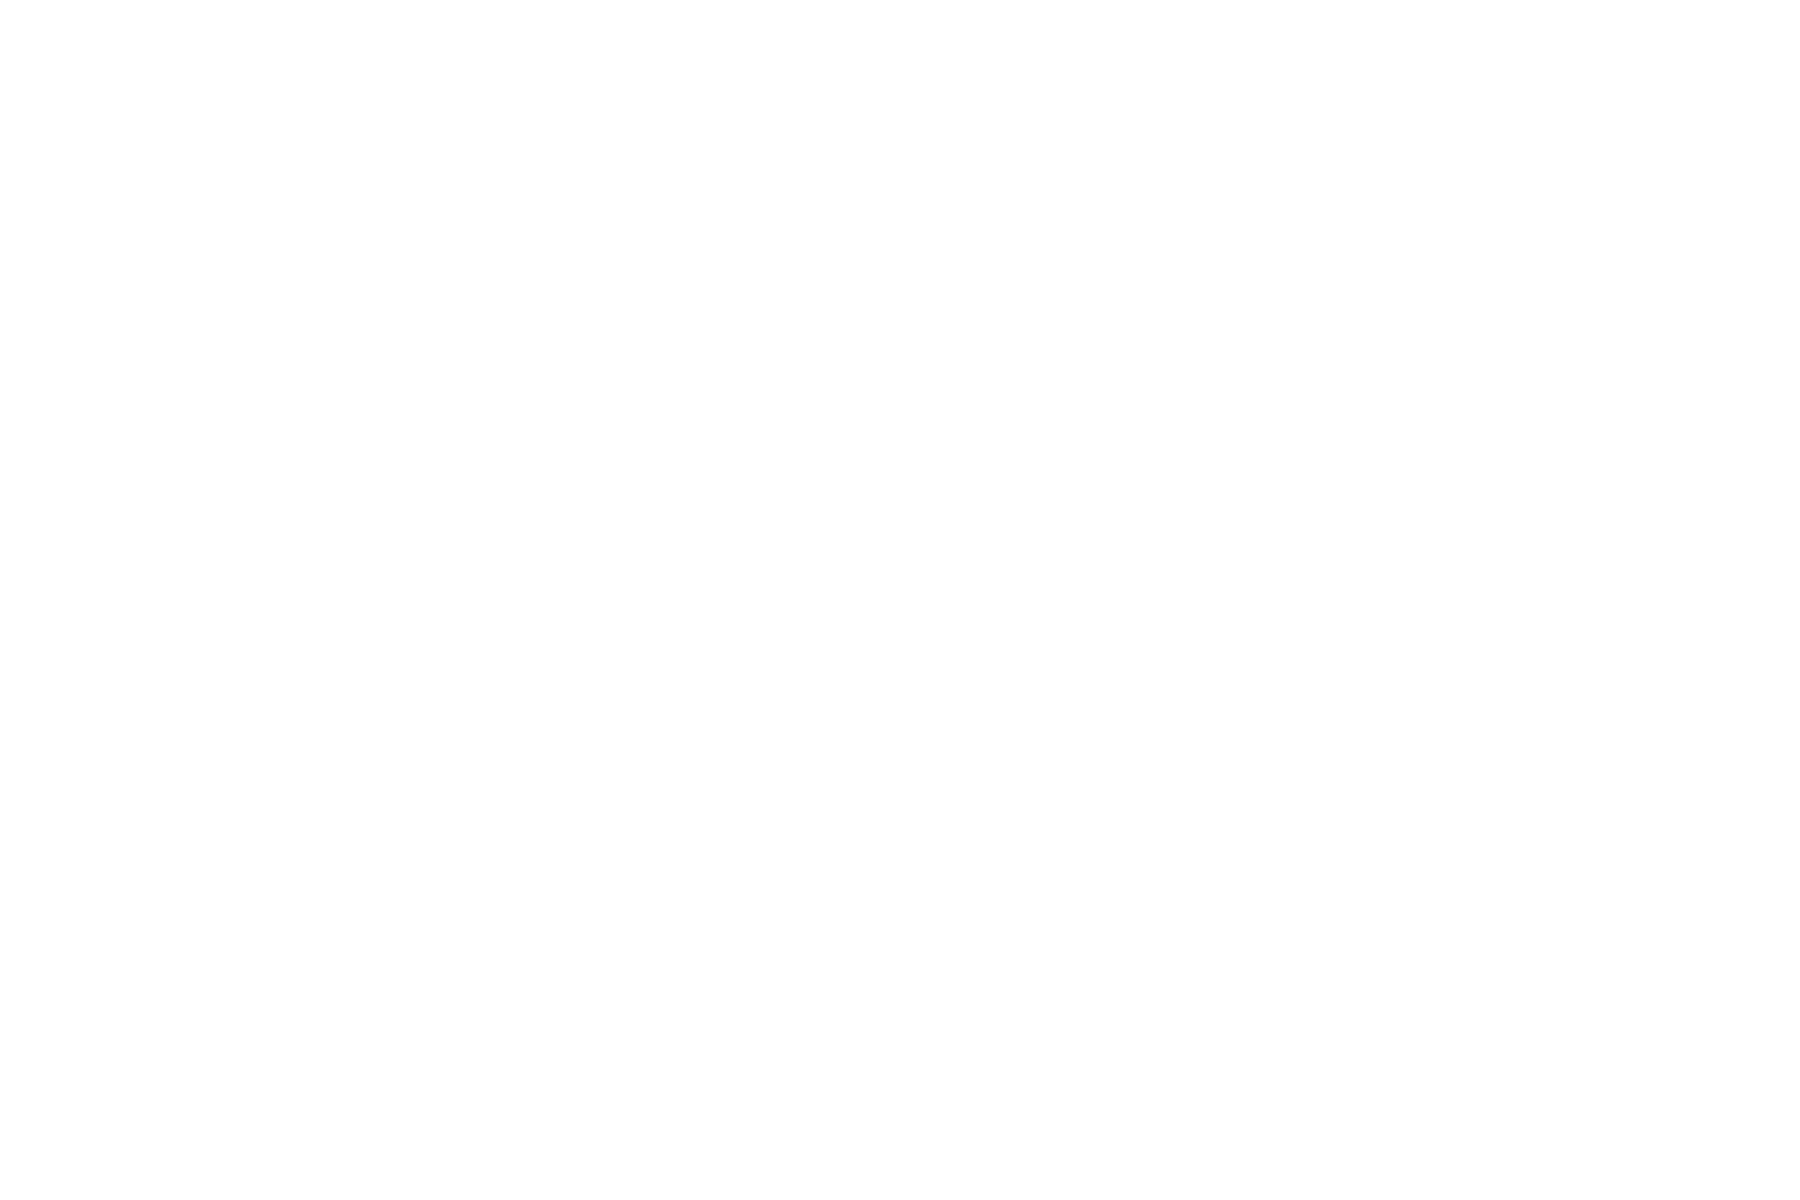 TruBlueAV